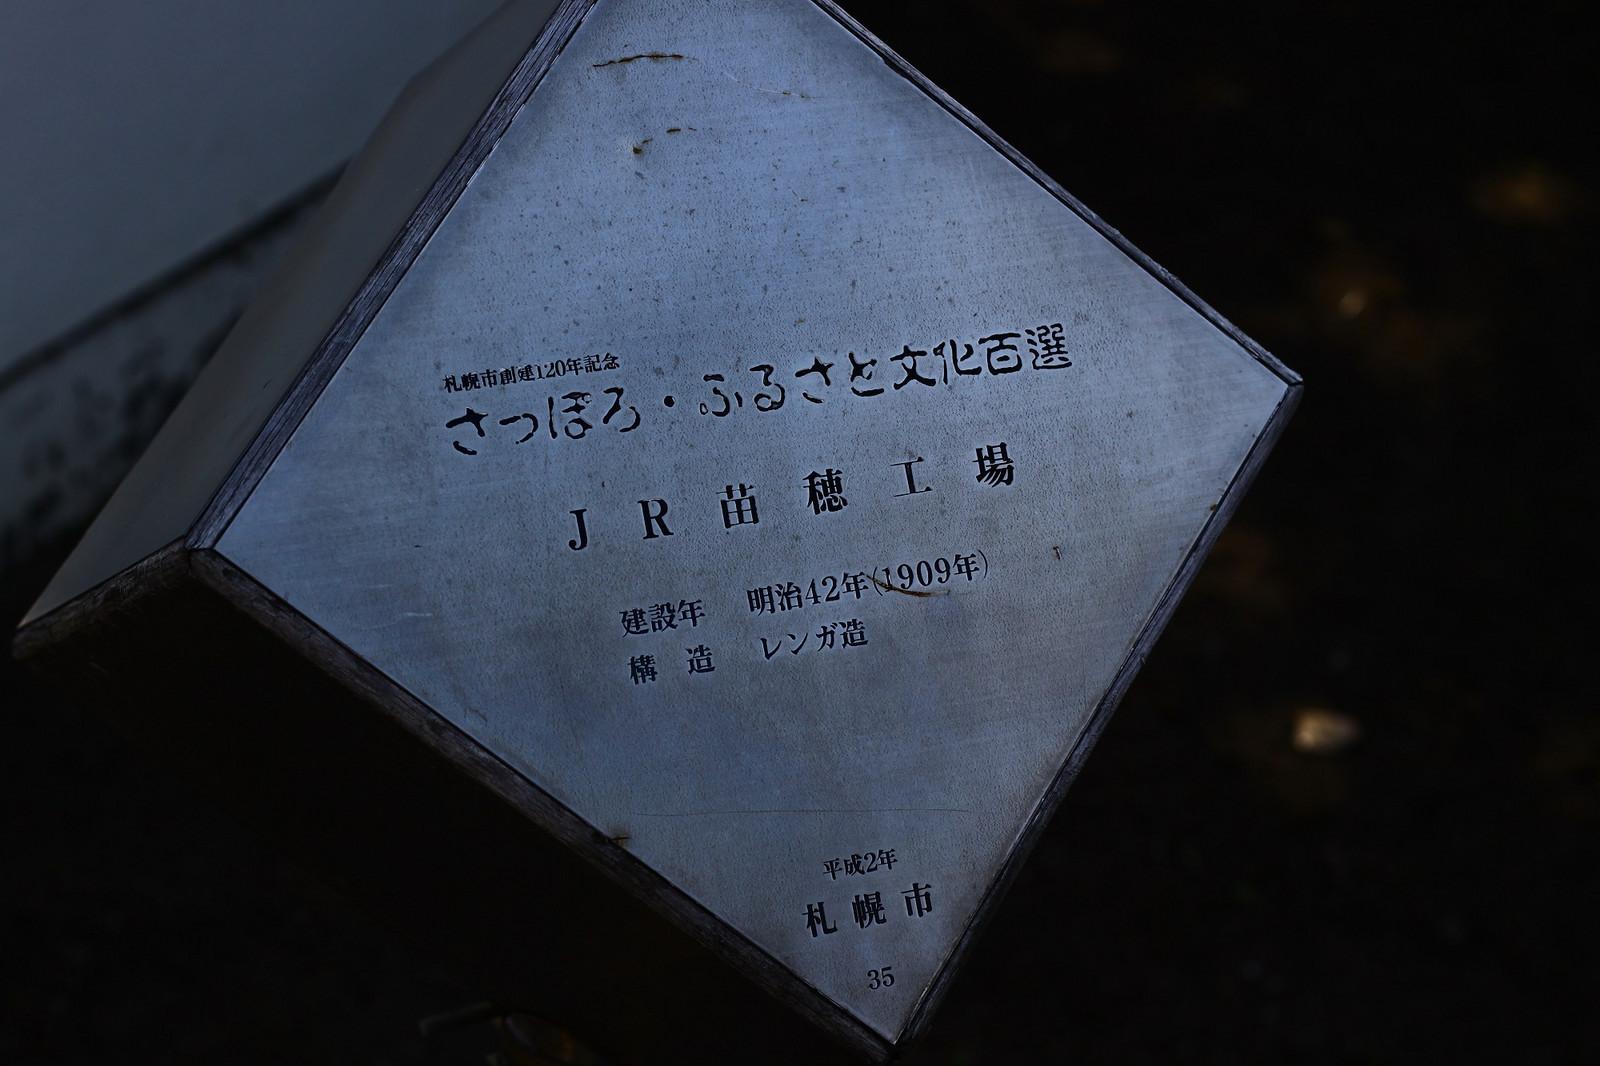 Jr1708090037